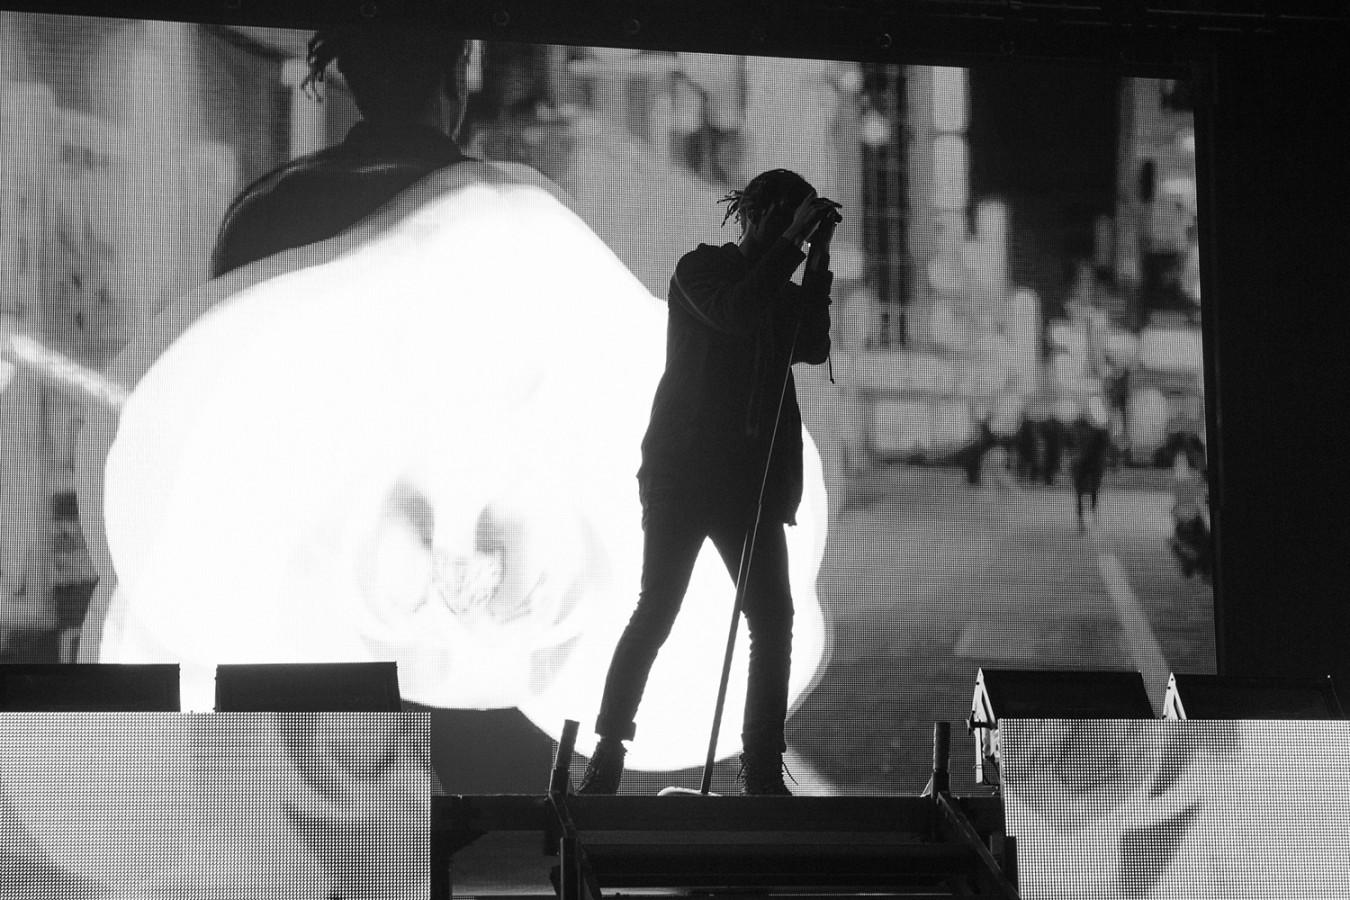 asap-rocky-tyler-the-creator-tour-backstage-41-1350x900